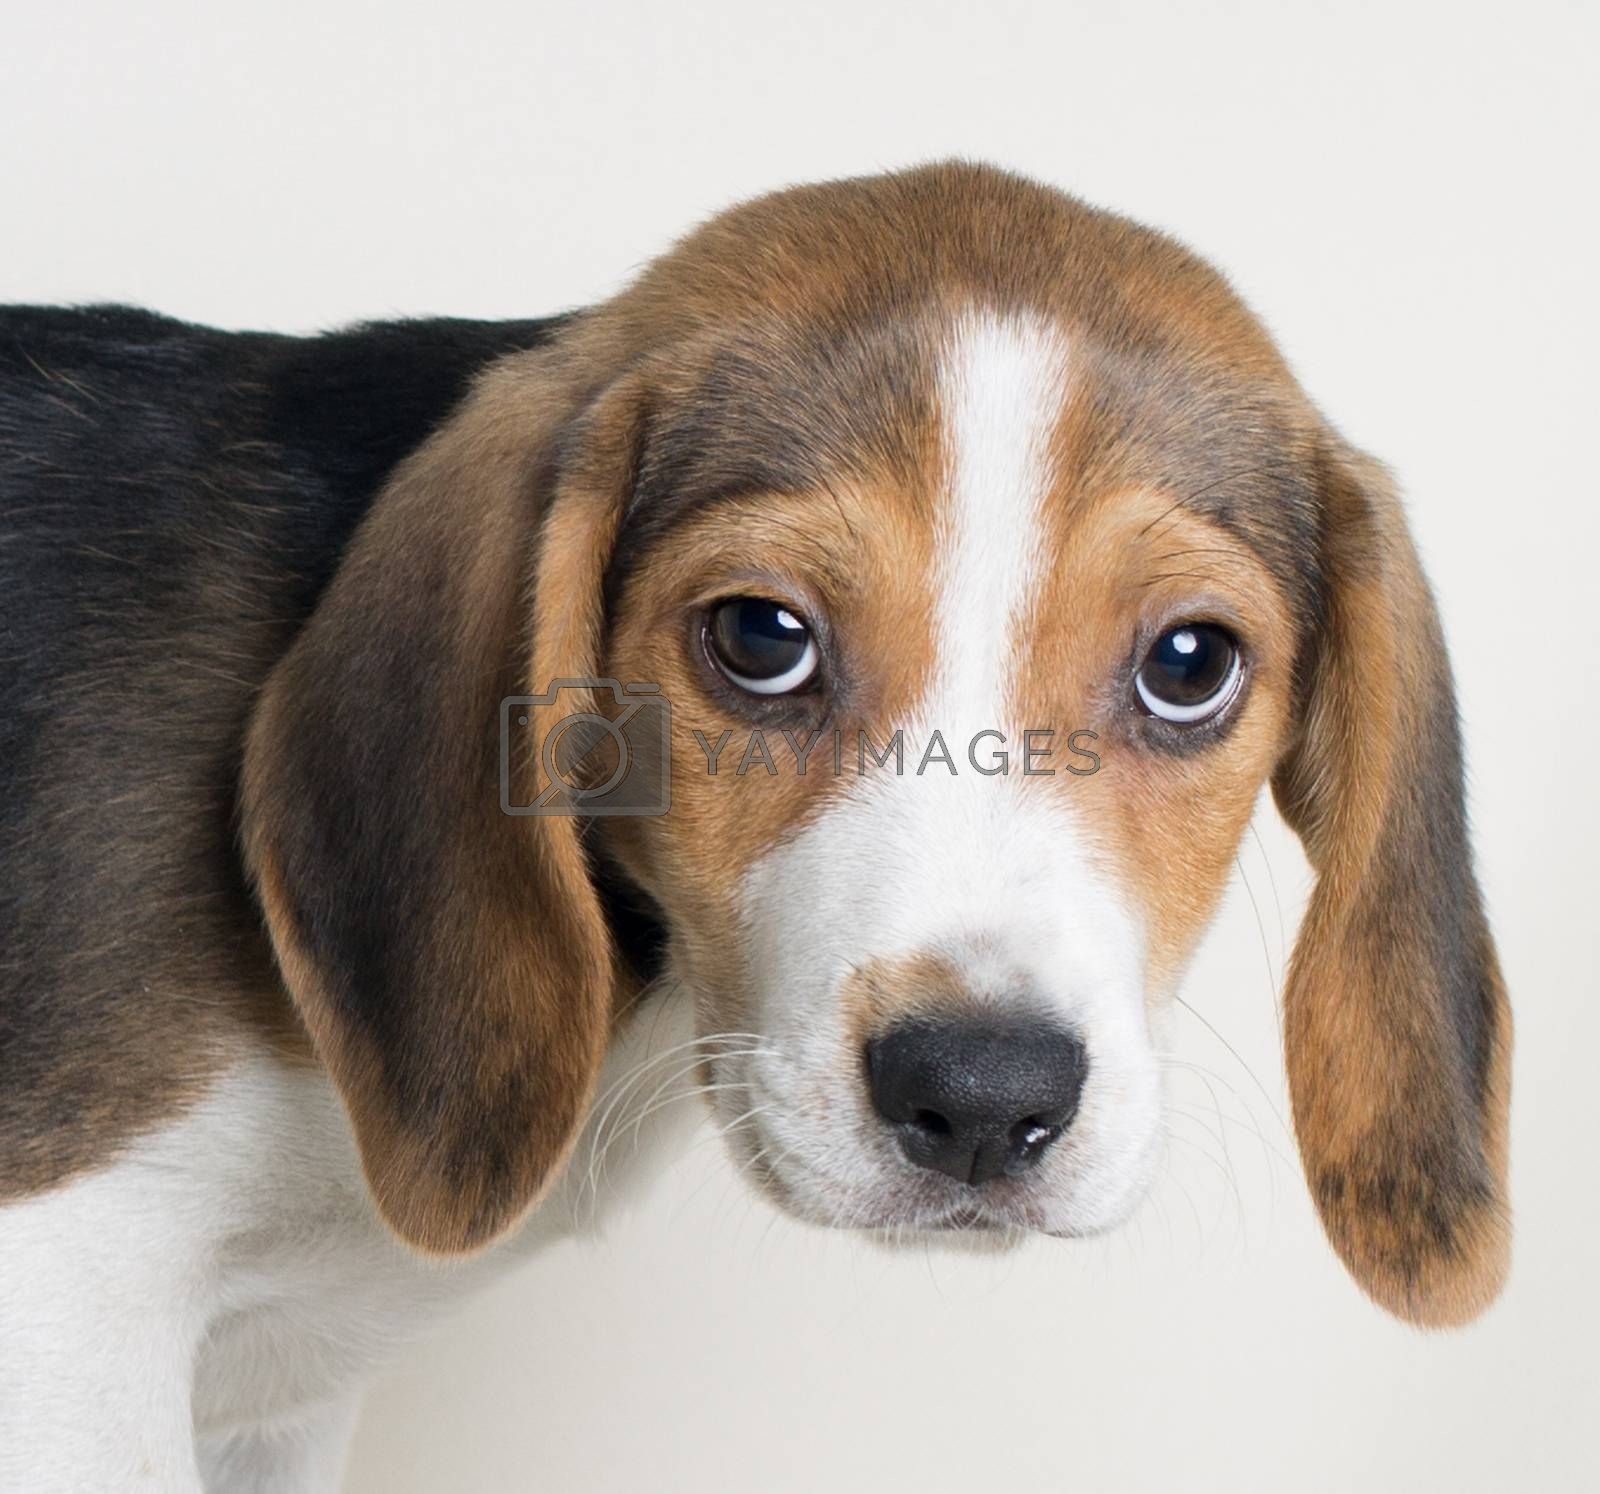 Close-up portrait of Beagle dog looking at camera on white bakcg by Endika